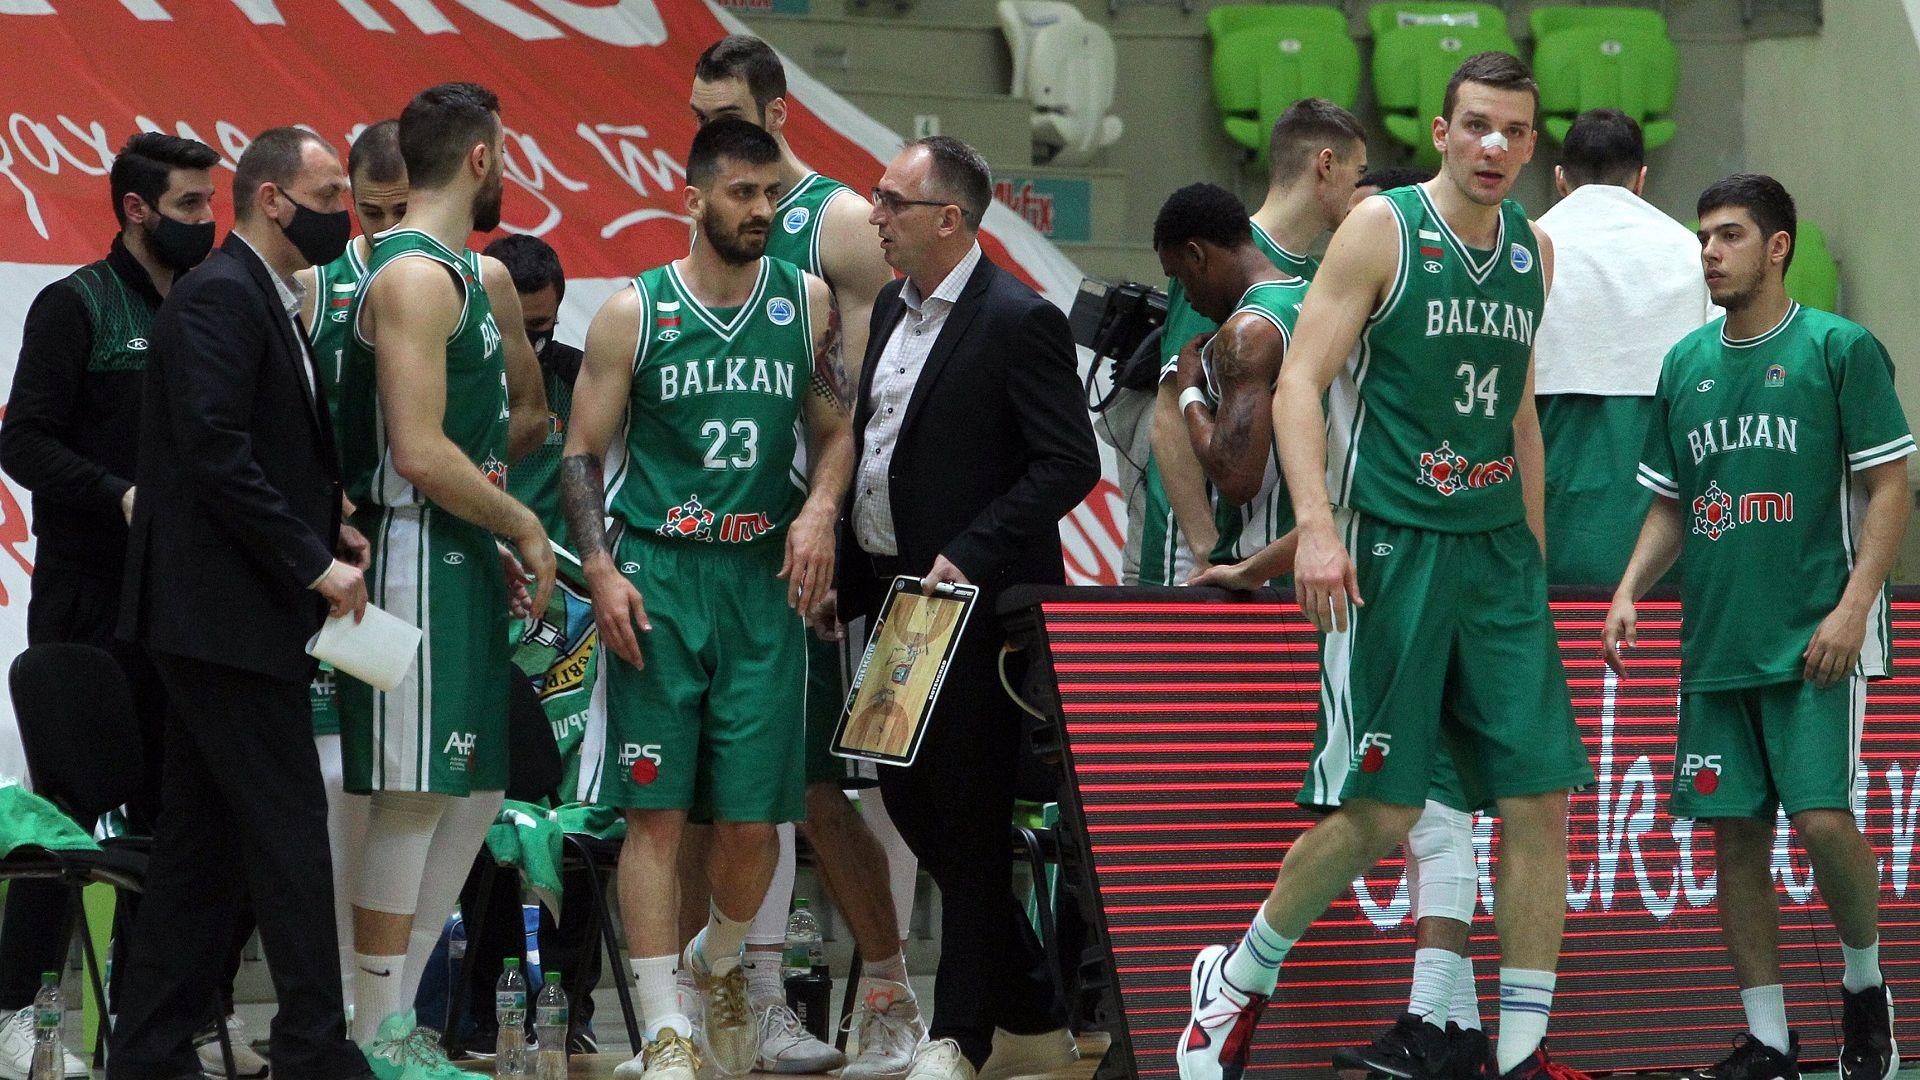 Исторически успех прати Балкан сред най-добрите 8 в европейски турнир